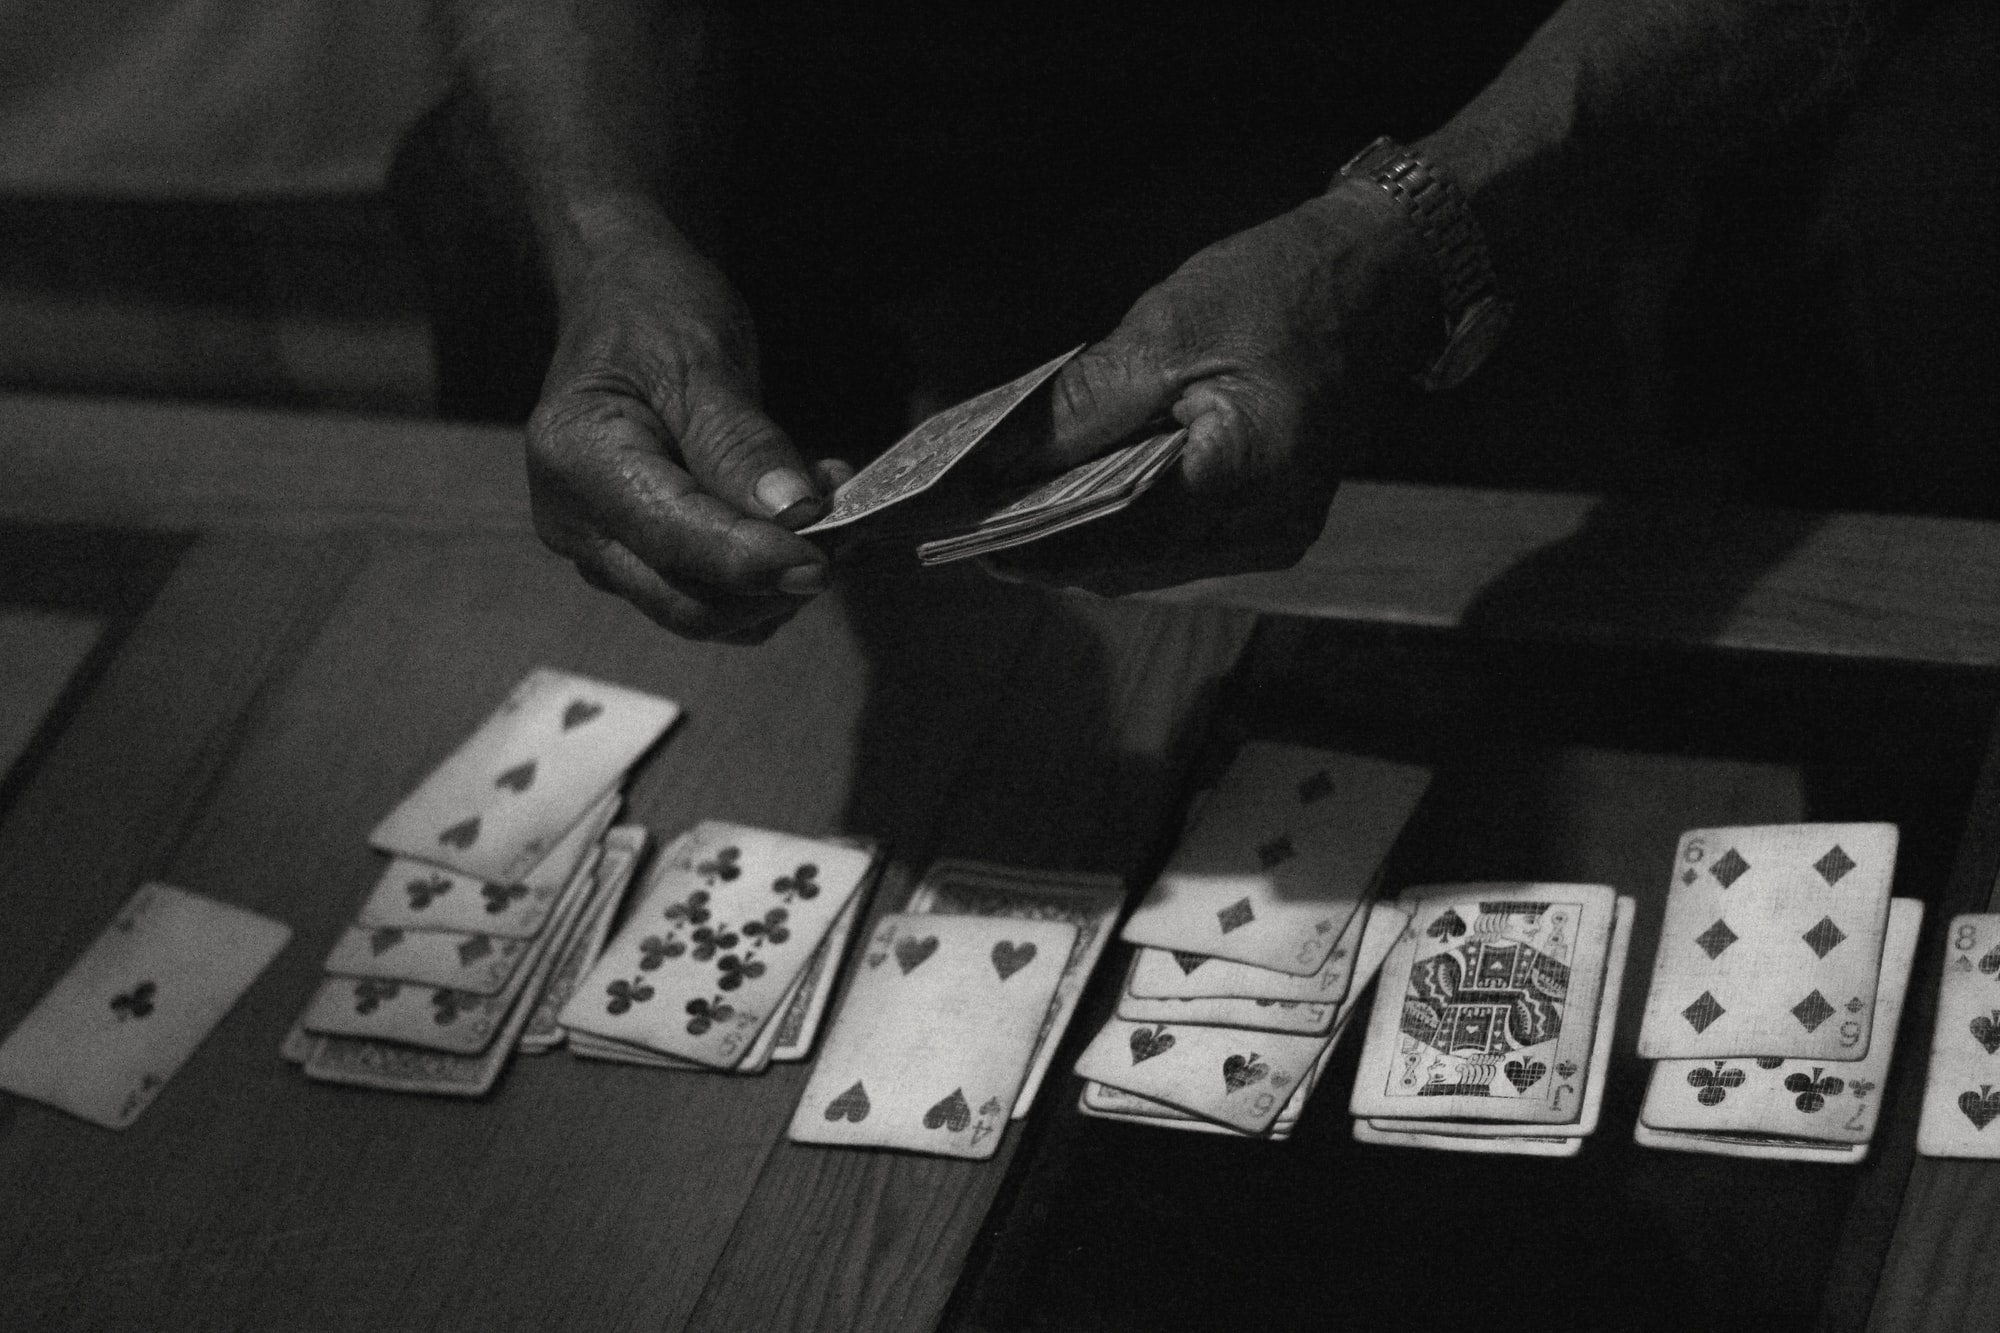 Solitario Klondike online: gioca gratis